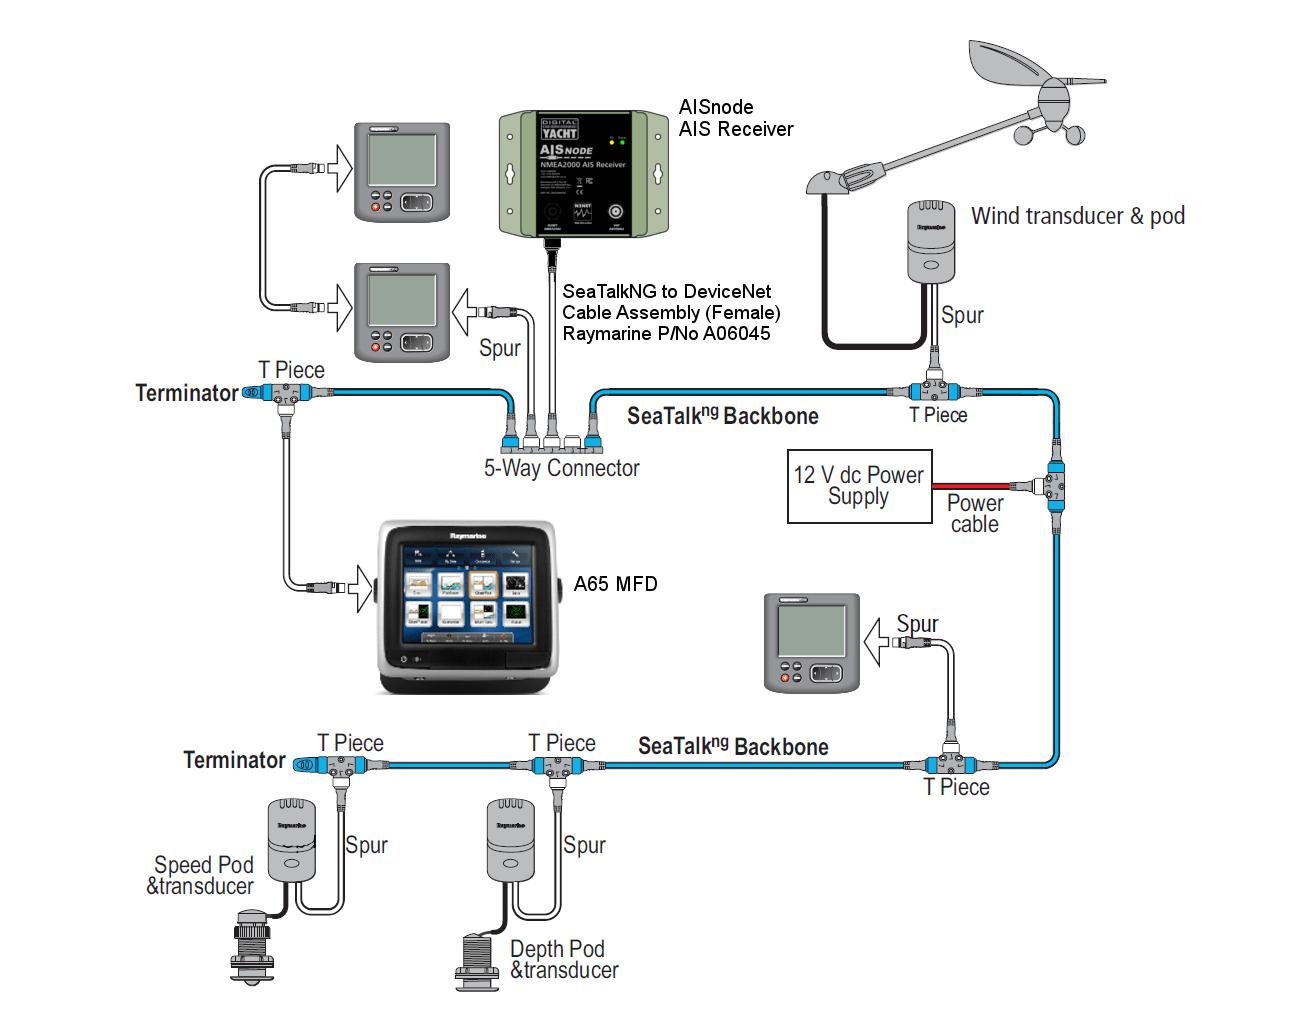 aisnode to raymarine seatalkng network 1?resize\\\\\\\=960%2C750\\\\\\\&ssl\\\\\\\=1 wiring diagrams yamaha vega r yamaha steering diagram, yamaha lowrance elite 5 wiring diagram at gsmportal.co